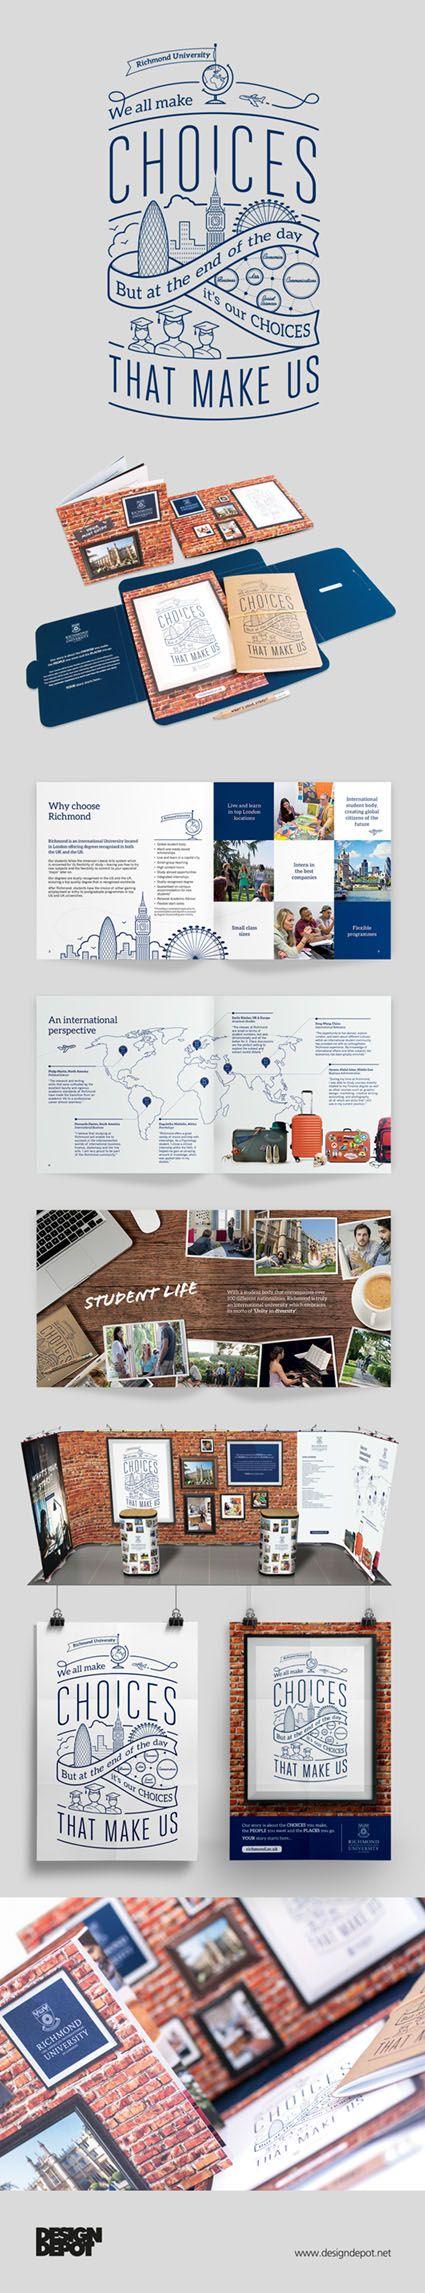 Richmond artwork, London, university, identity, welcome pack, branding, design depot, prospectus, education, #DesignDepot